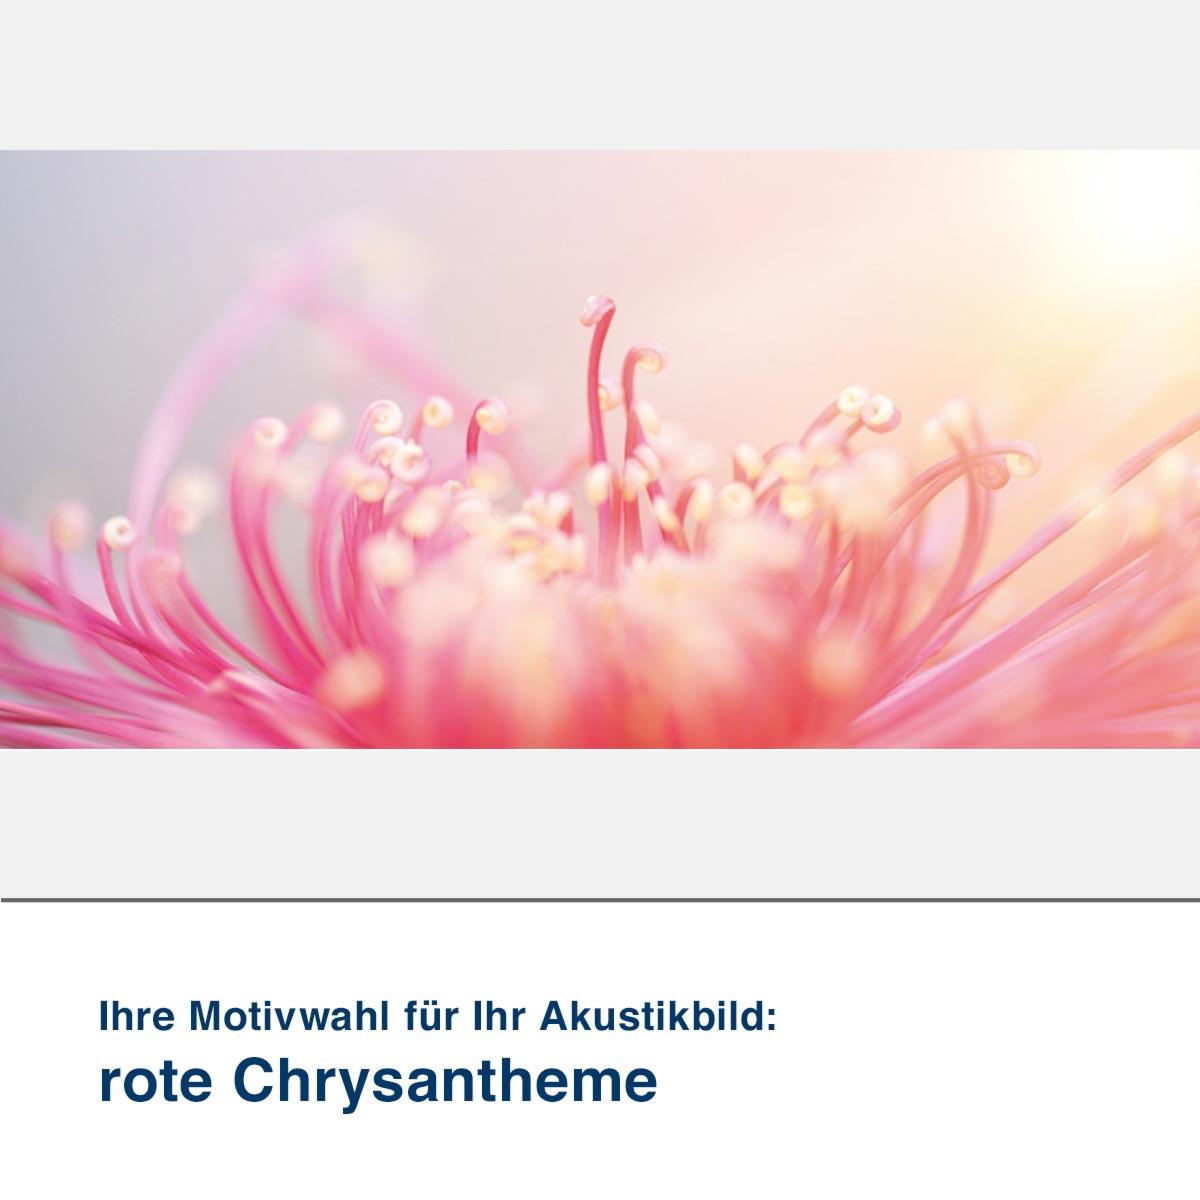 Akustikbild Motiv rote Chrysantheme